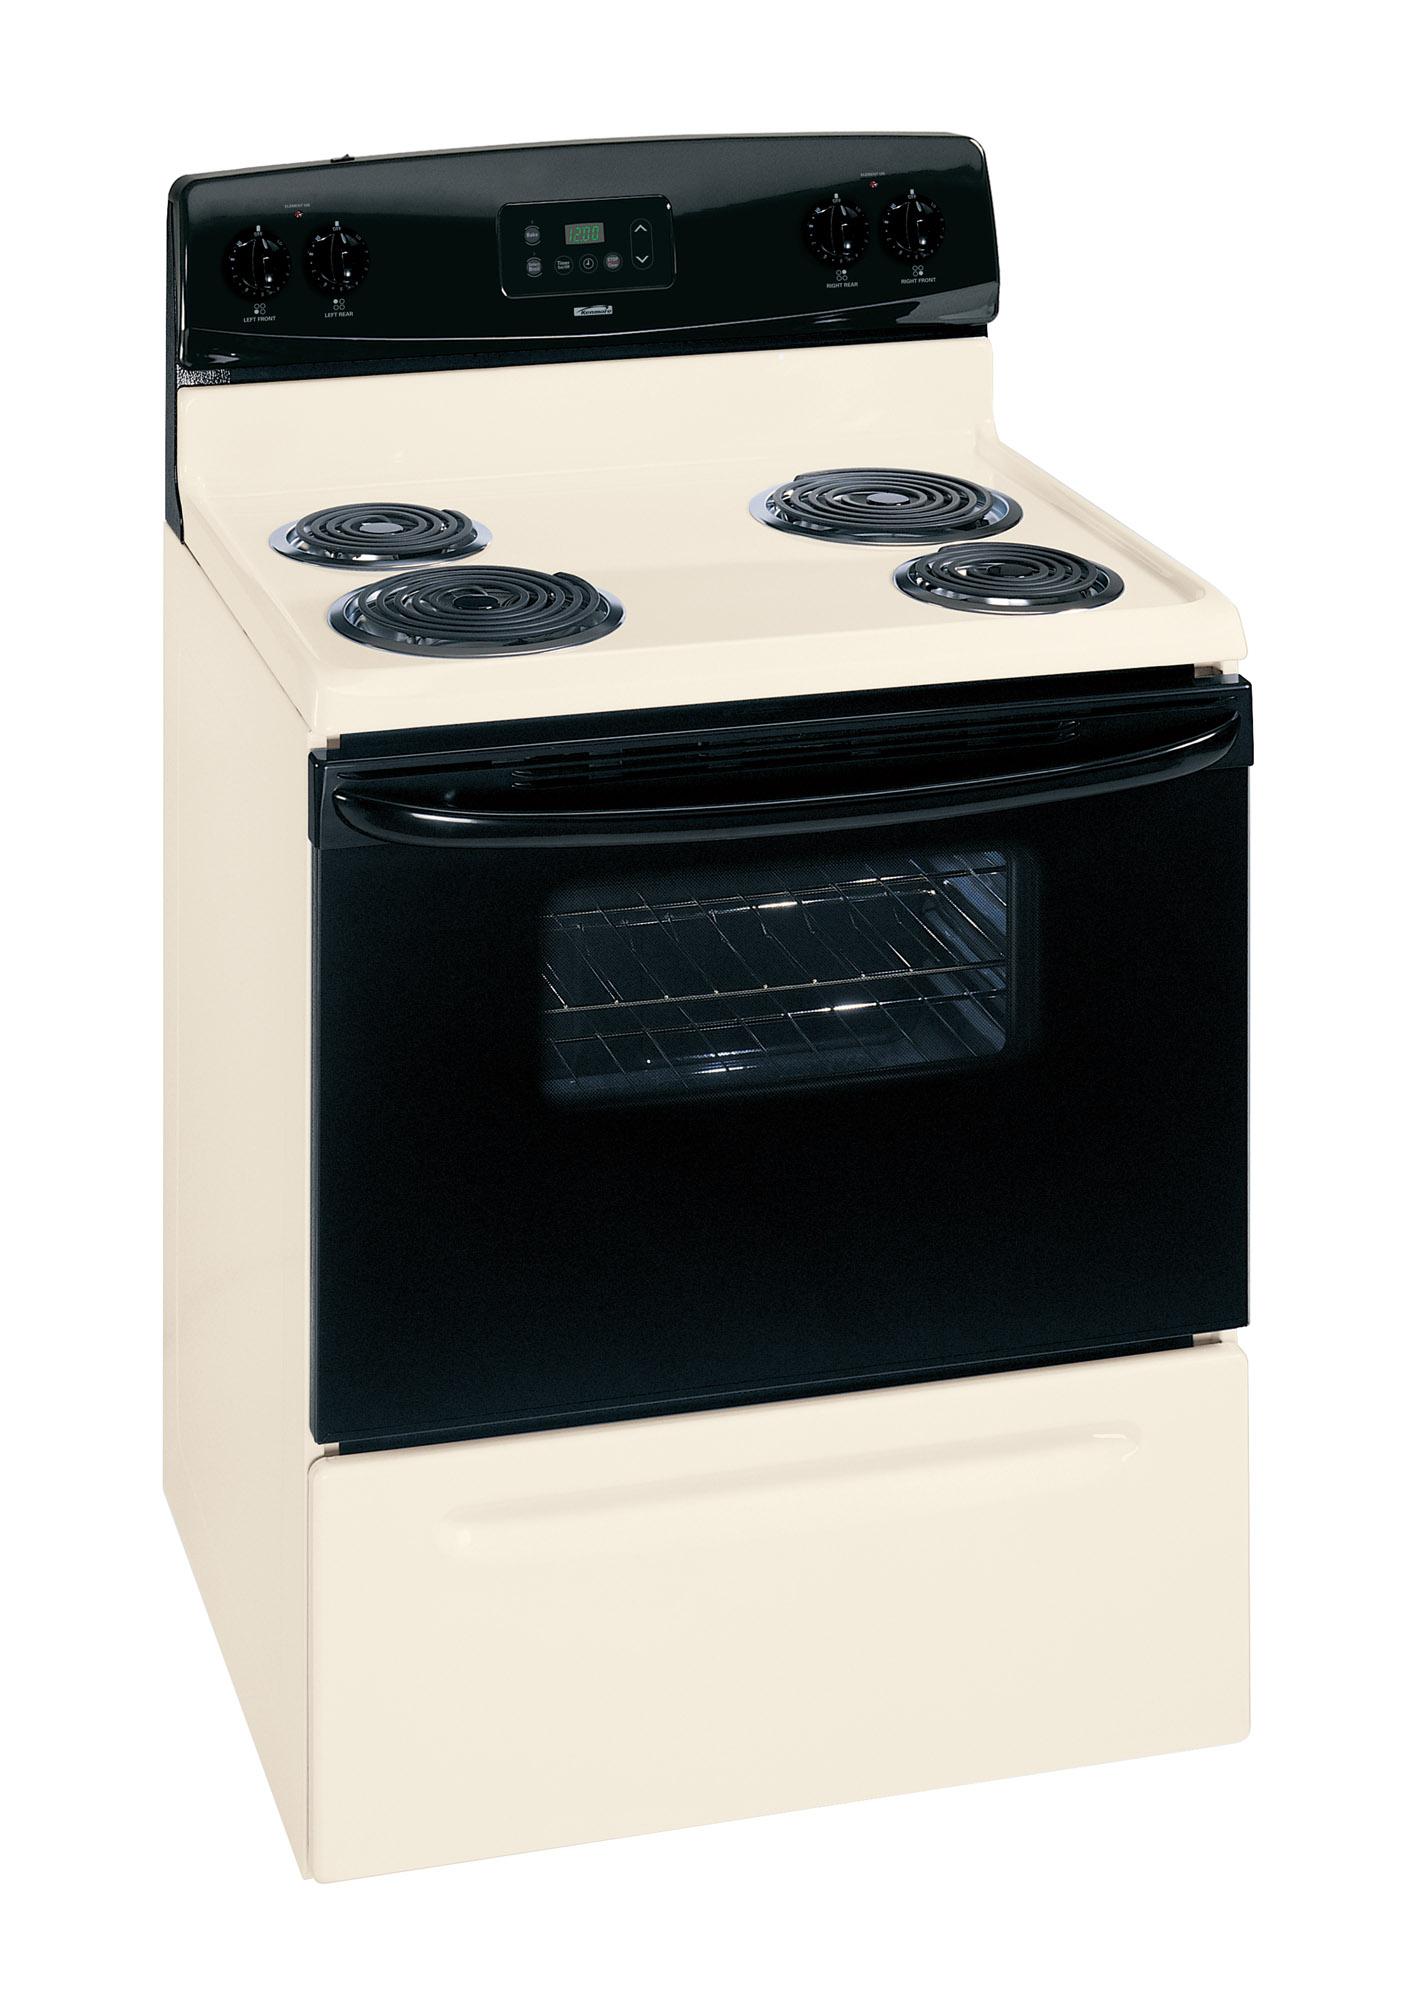 Kenmore Range/Stove/Oven Model 790.90830607 Parts